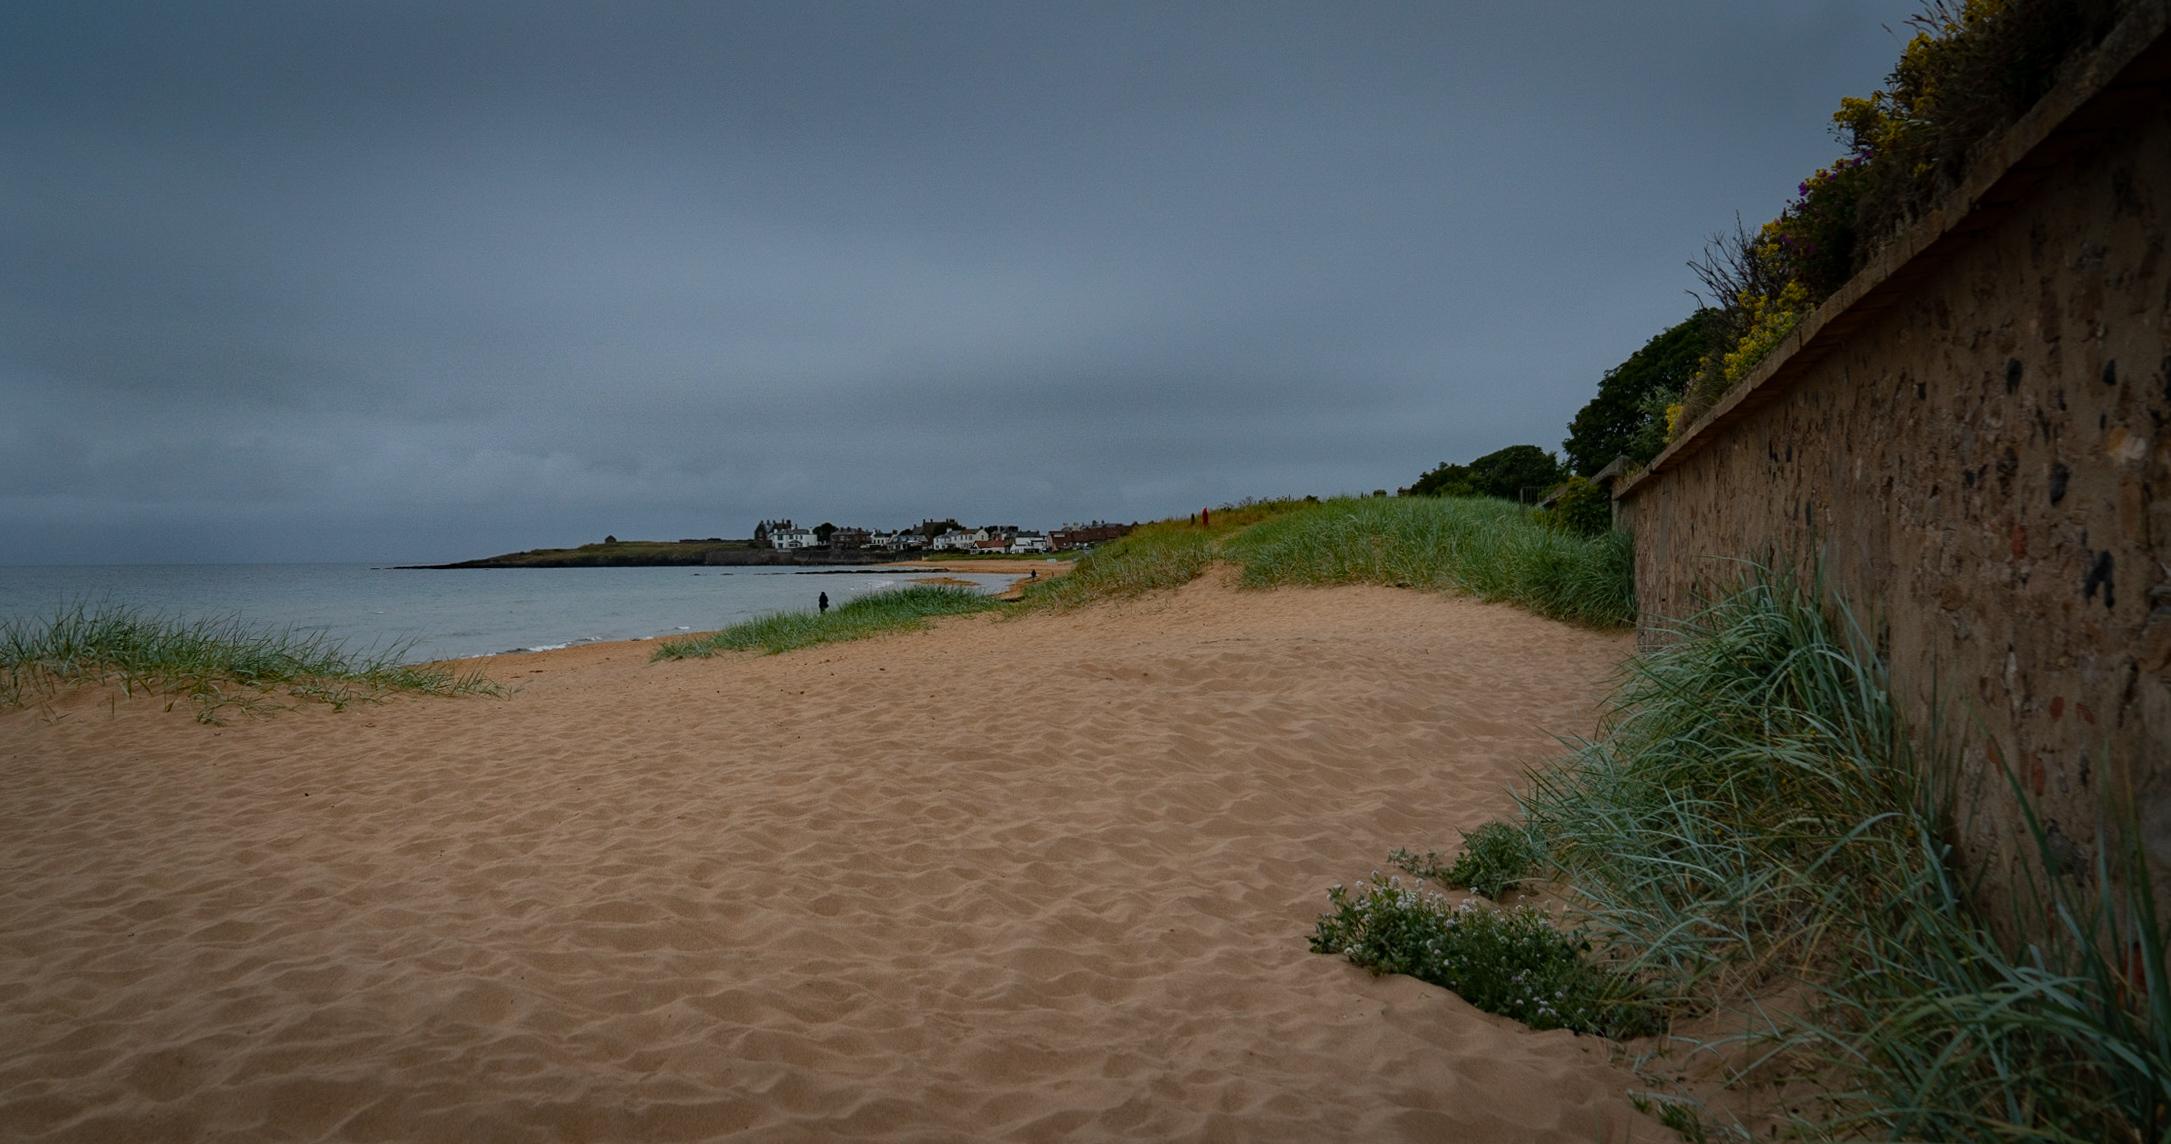 #beach, #scotland, #elie, #coast, #eastcoast, #clouds, #countryside, #tranquil, #northsea